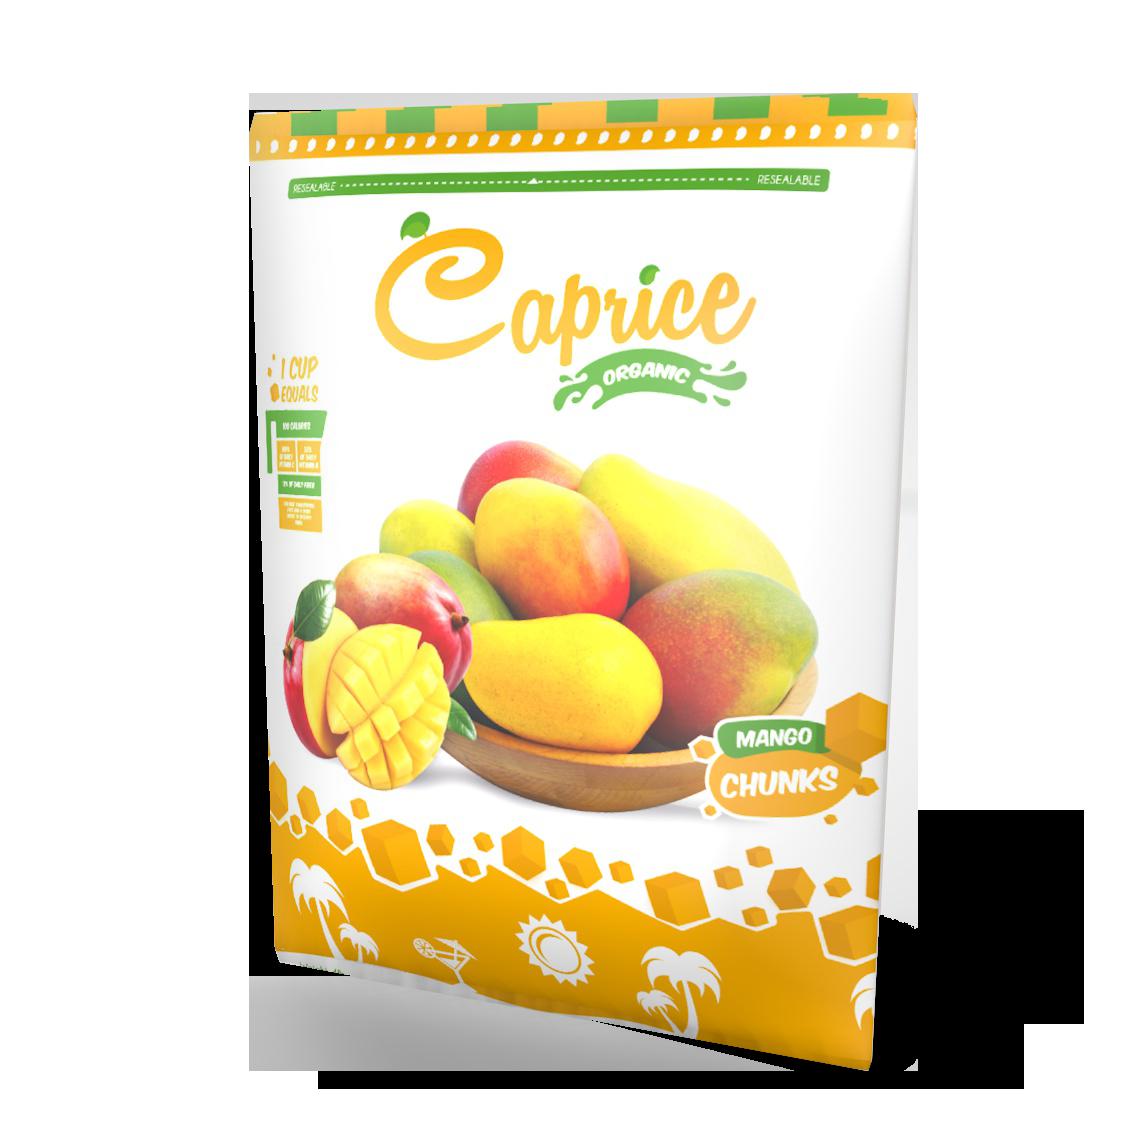 Caprice organic s ceviche. Mango clipart individual fruit